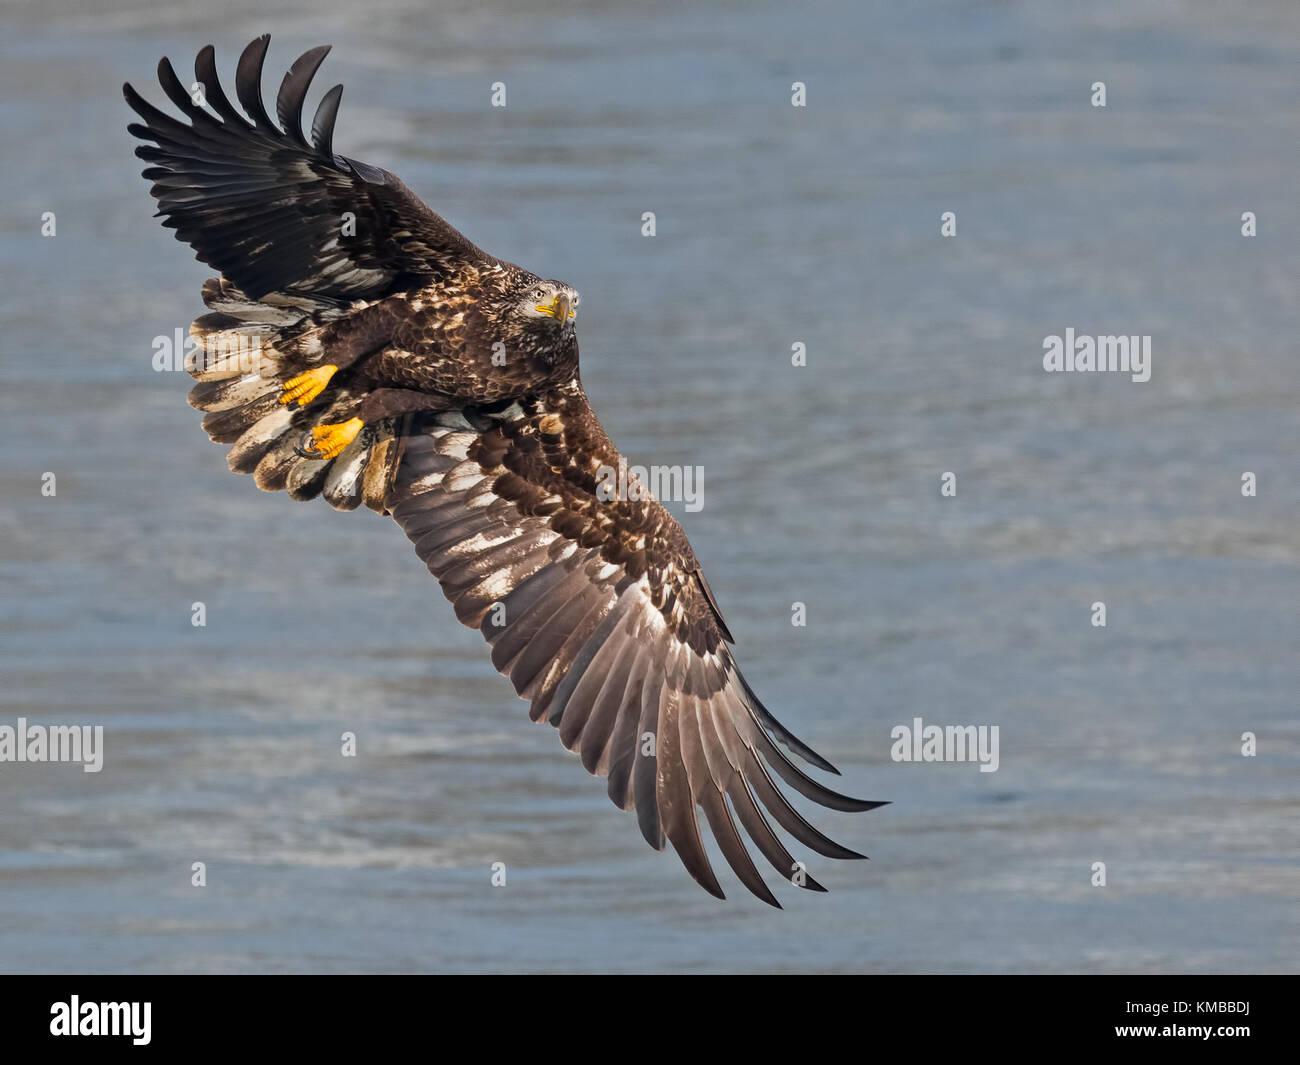 Juvenile Bald Eagle in Flight - Stock Image